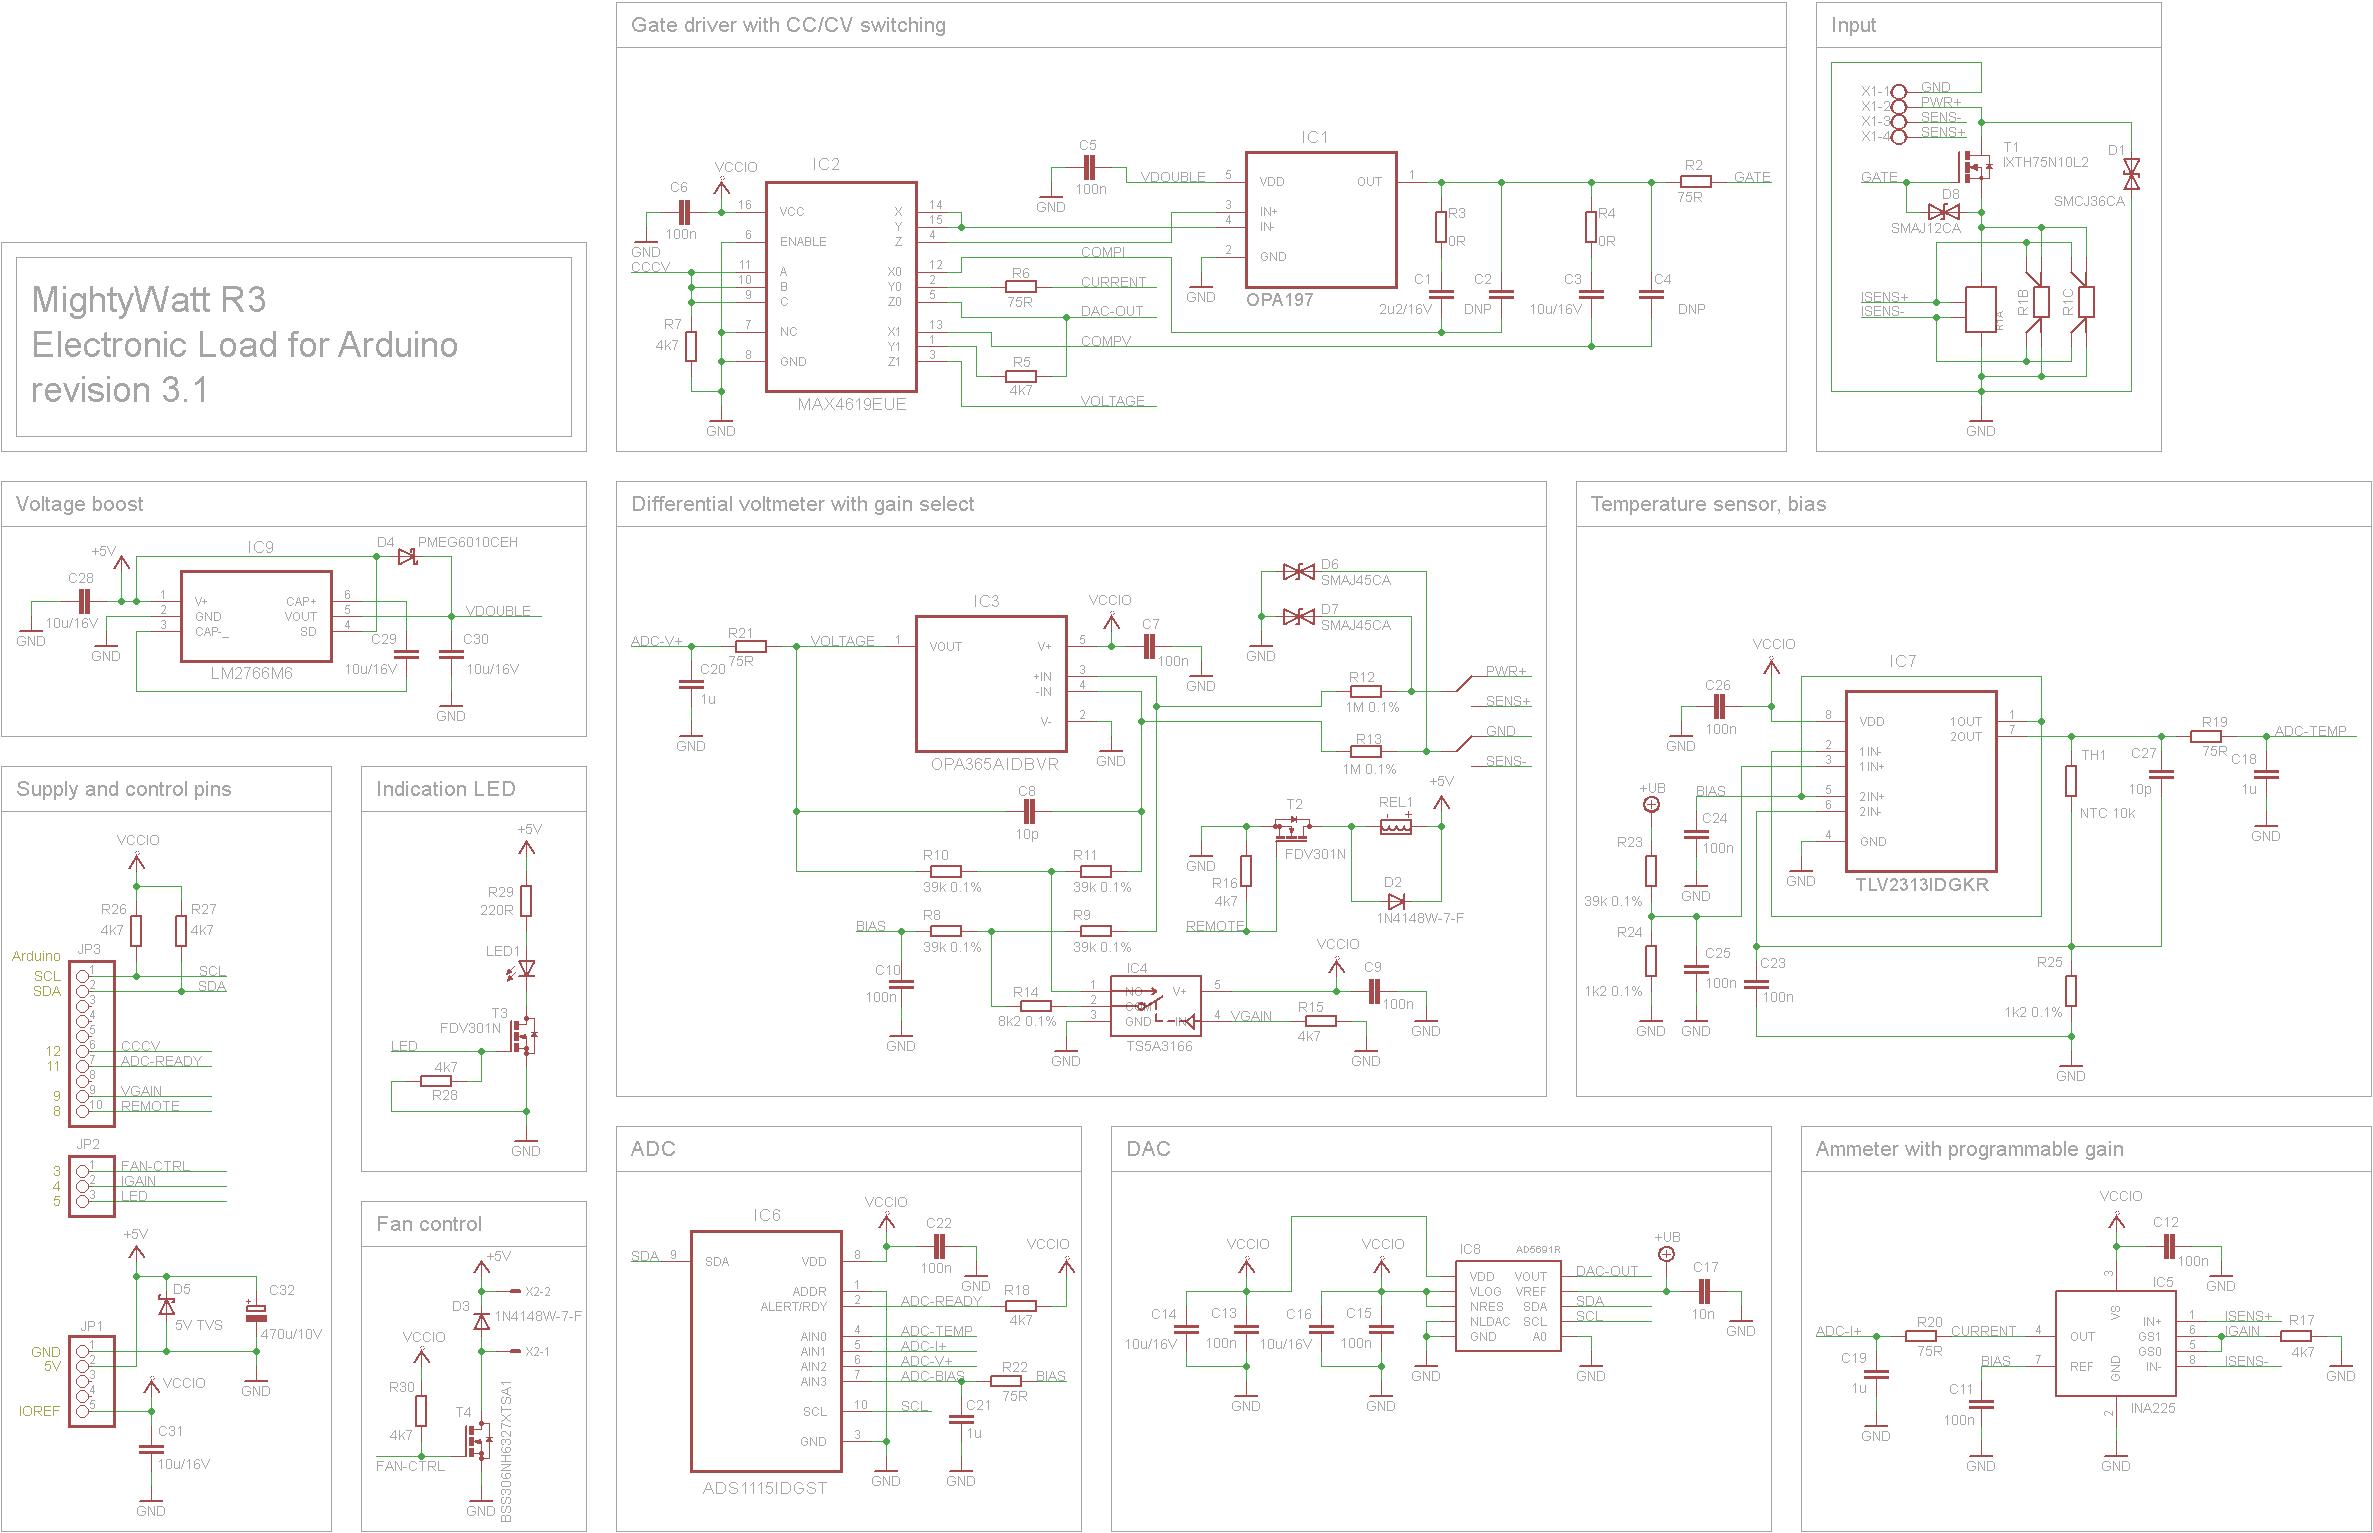 Mightywatt R3 70w Electronic Load For Arduino